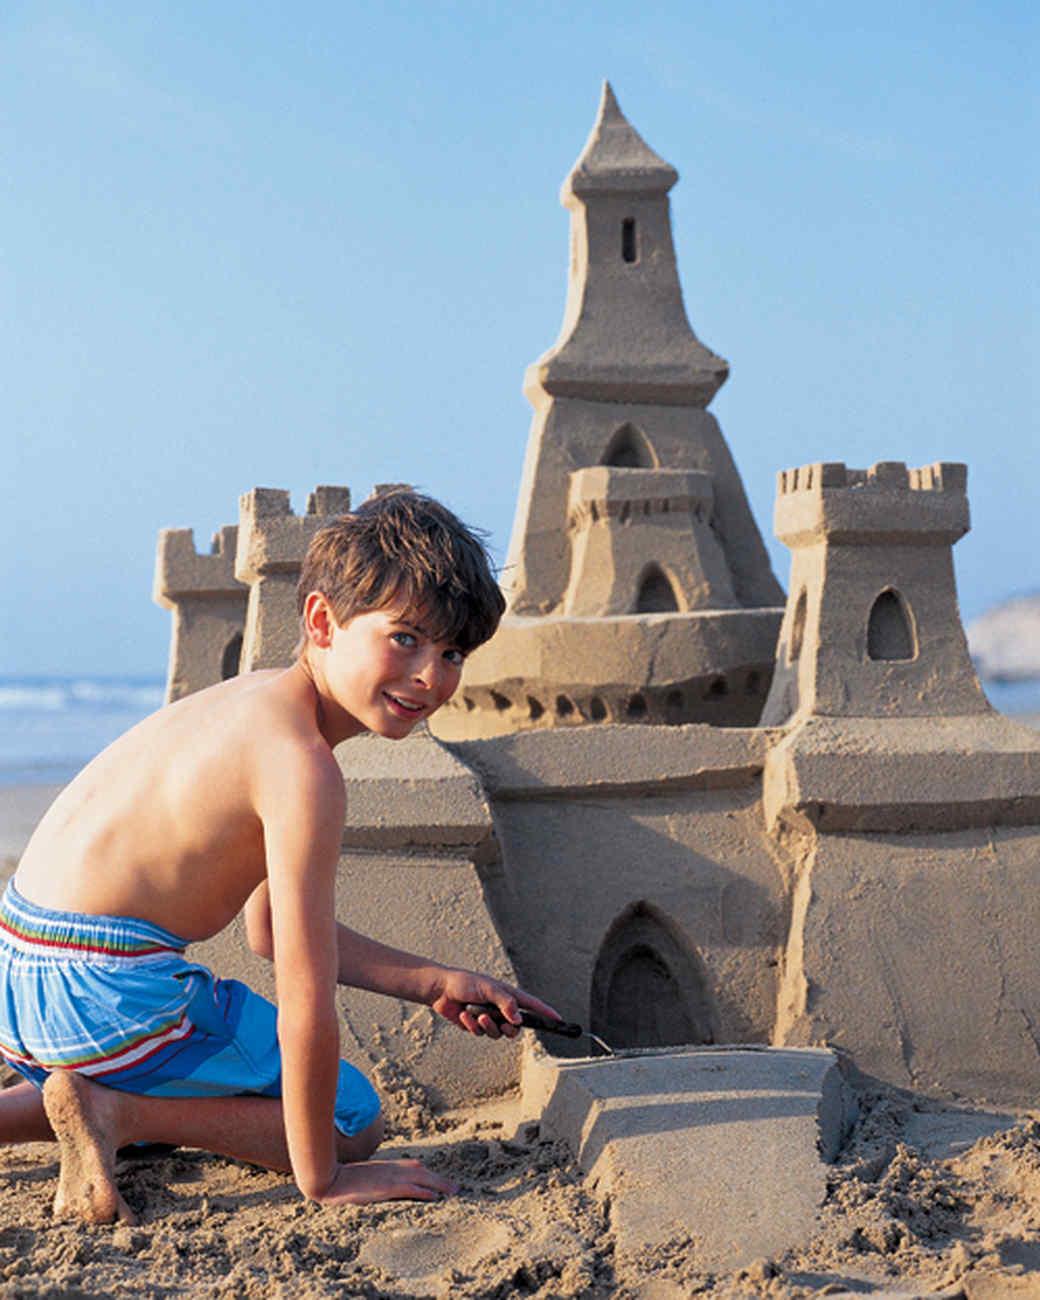 Building Sand Castles : How to build a sand castle martha stewart